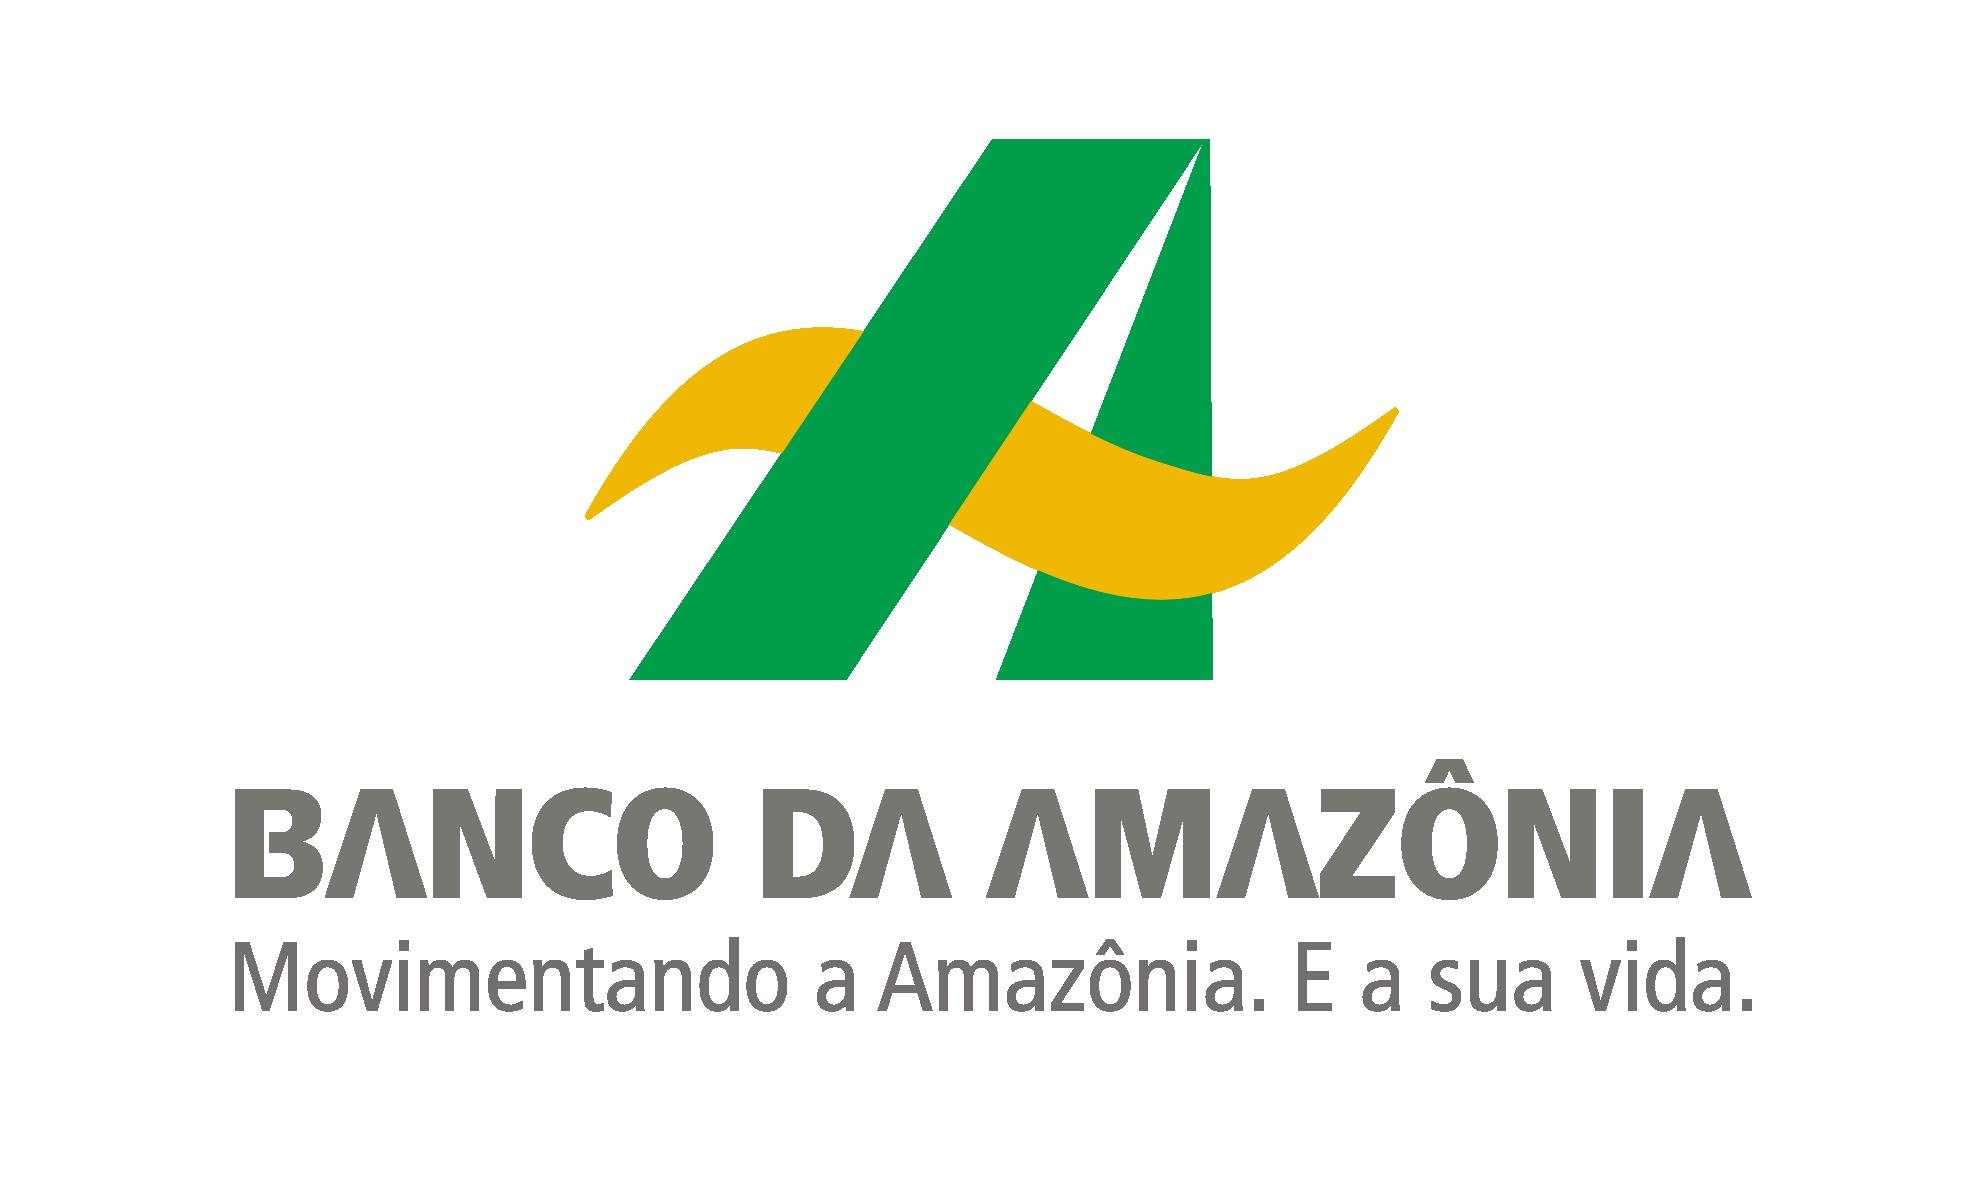 Banco da Amazonia Logo photo - 1